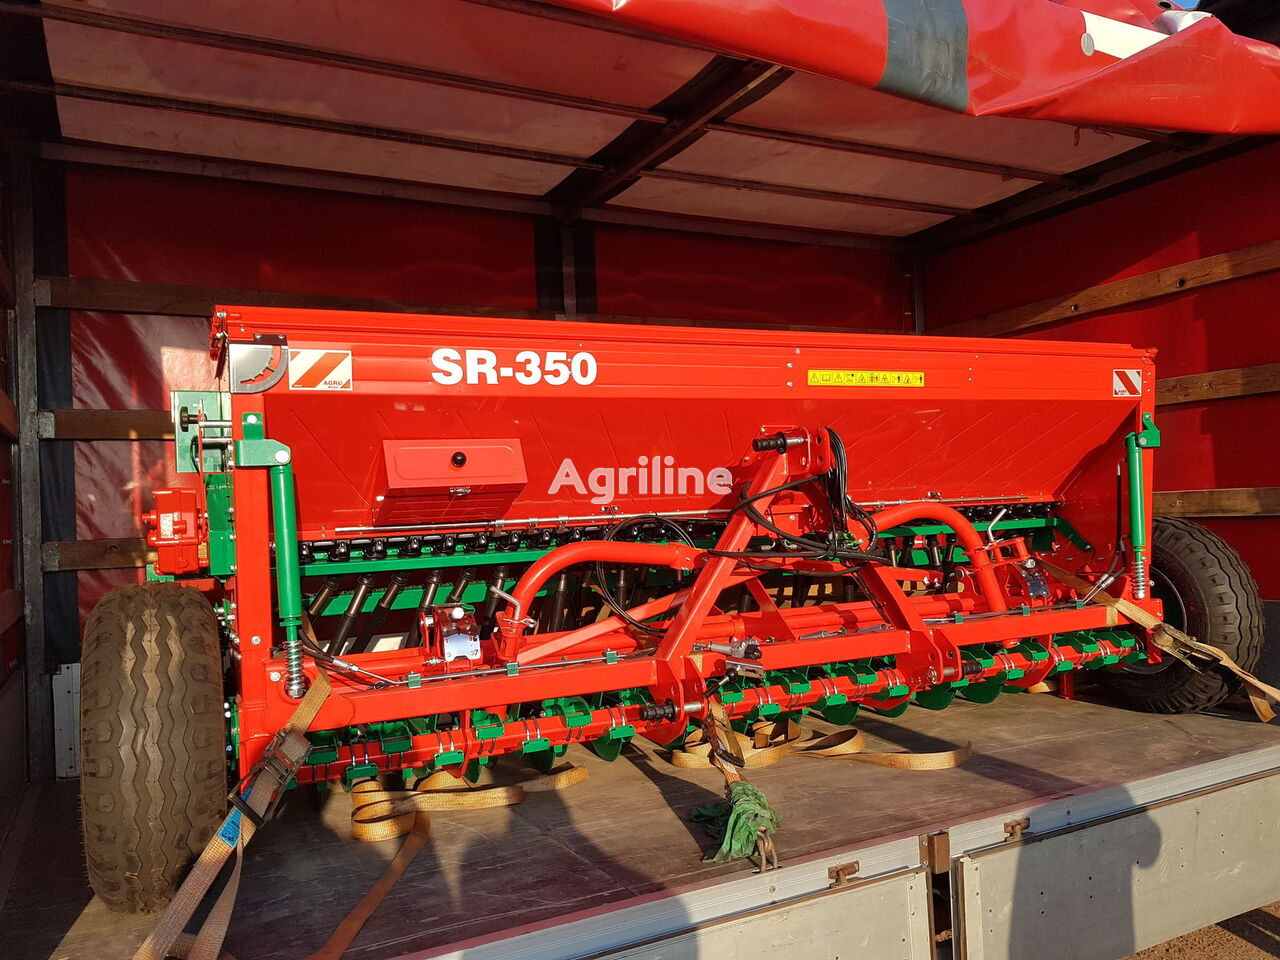 нова сівалка механічна AGRO-MASZ Сівалка механічна нова SR350II ГАРАНТІЯ 1 РІК!